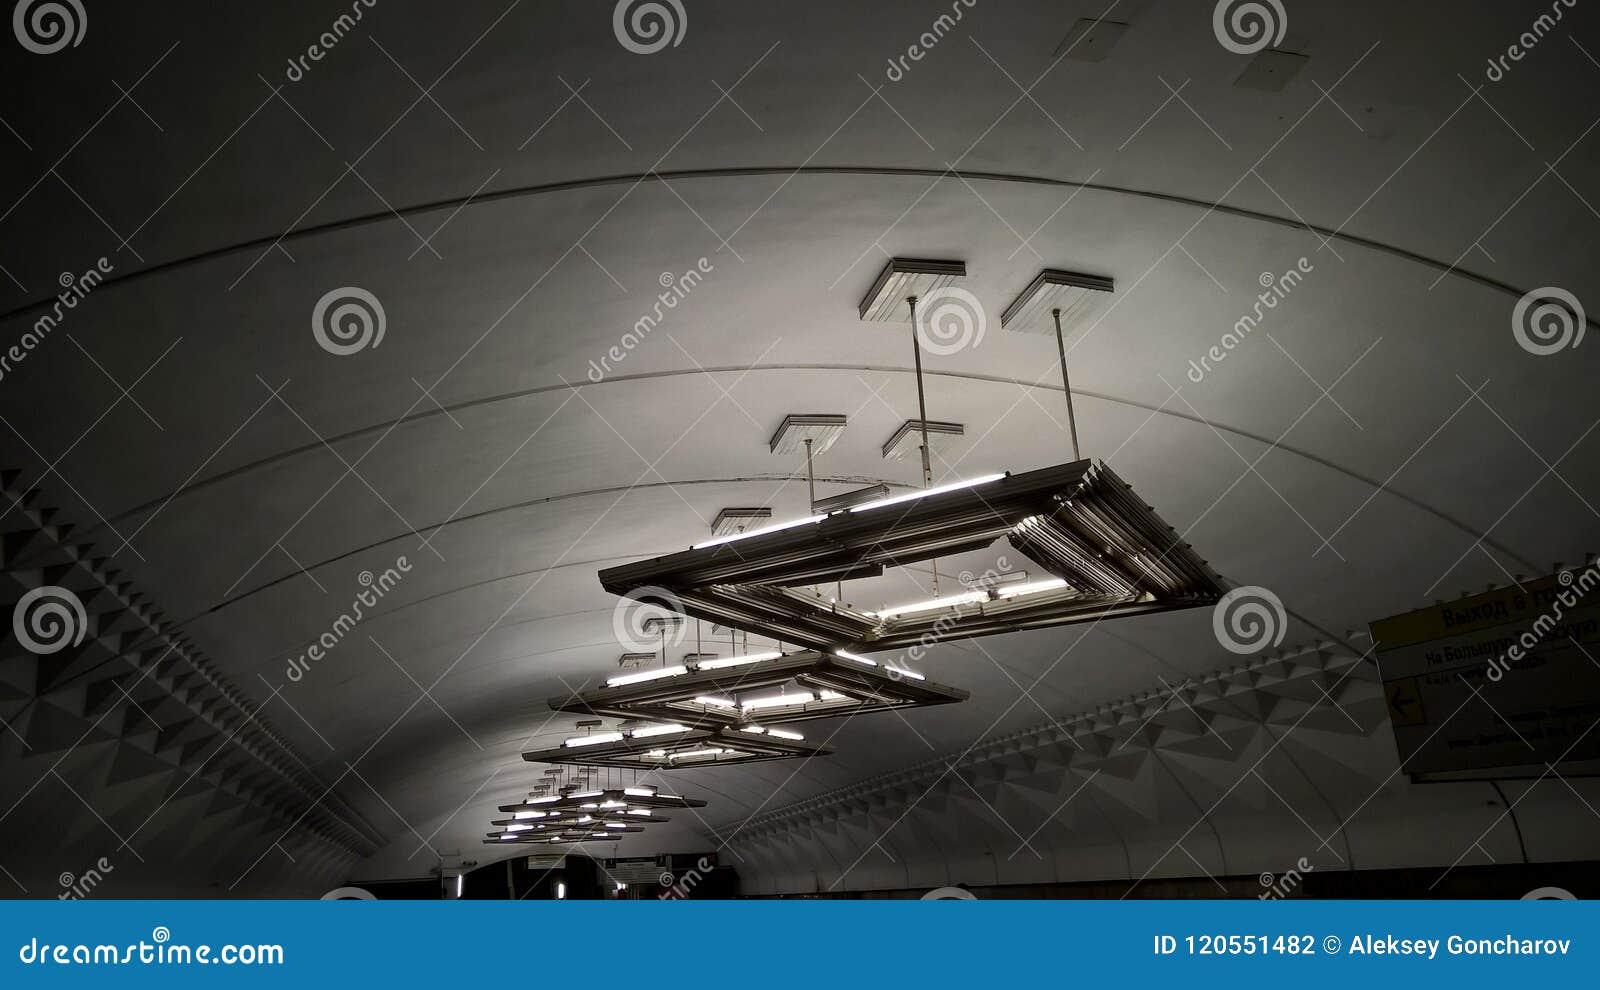 Moskwa, Rosja, metropolita, ` Tulskaya ` stacja metru, lampy - UFO